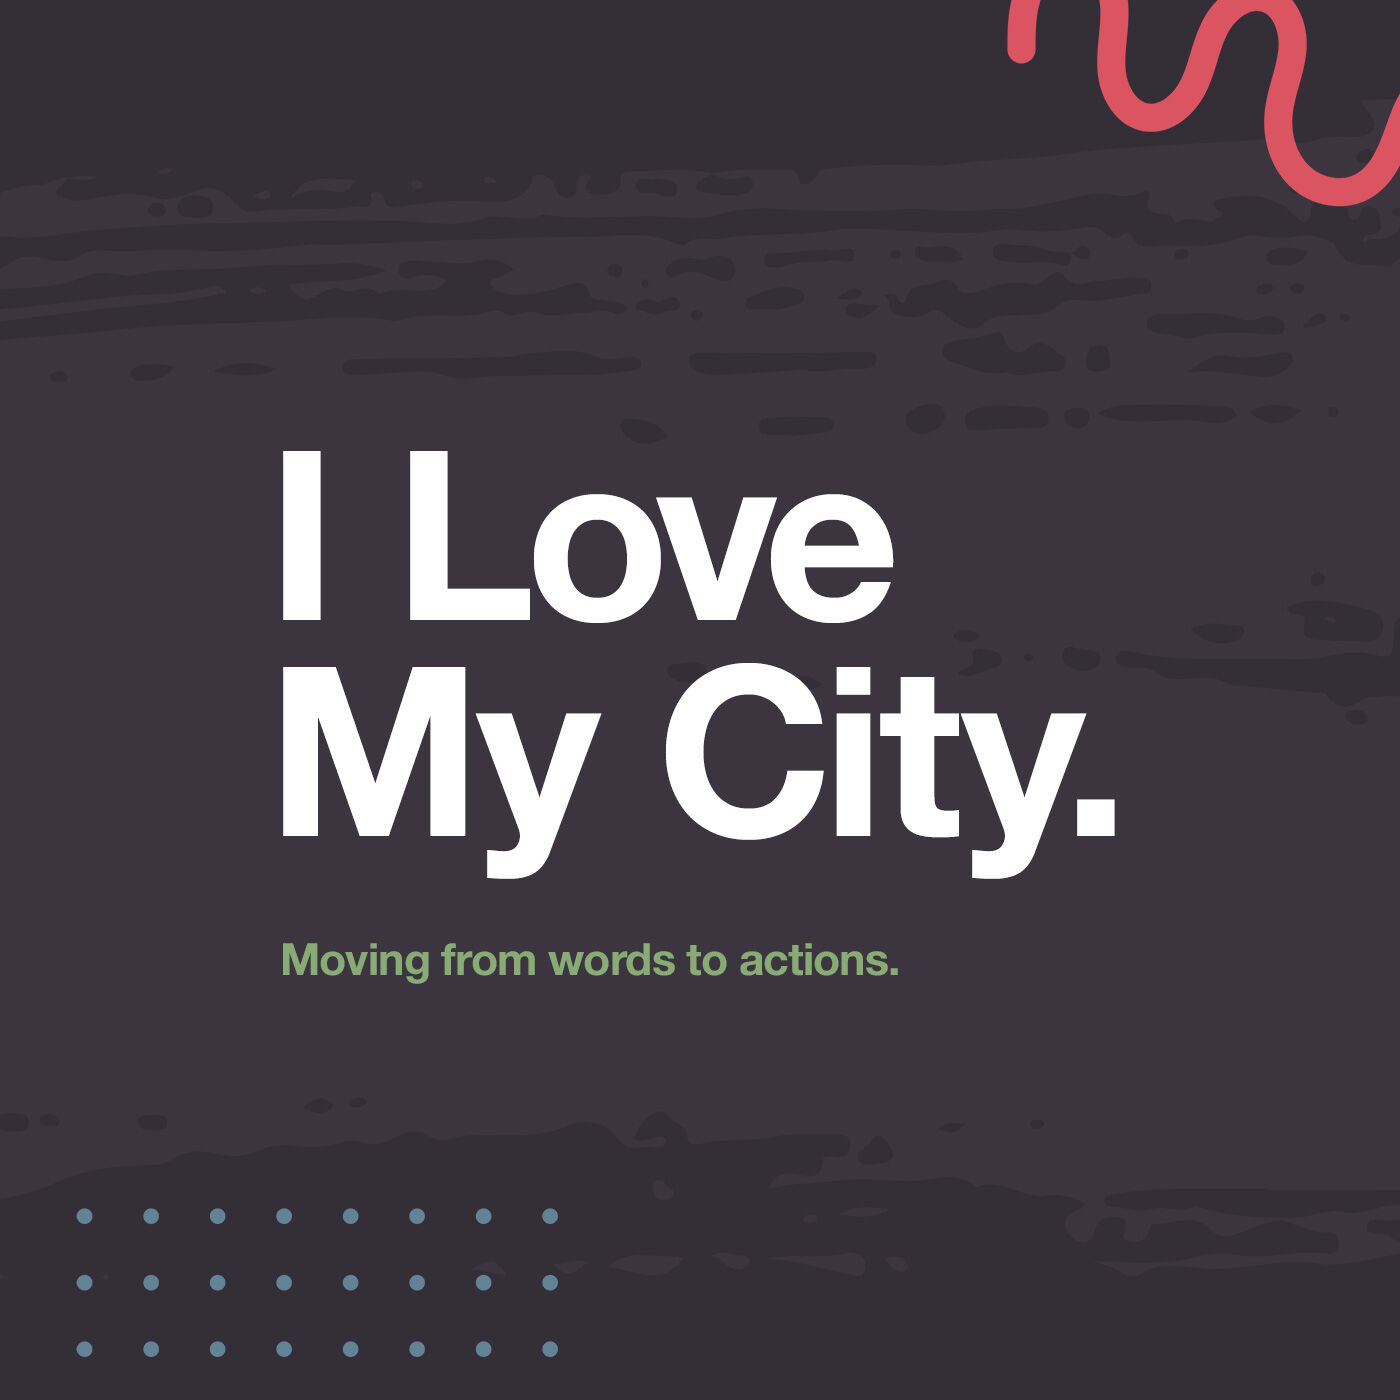 I Love My City 2021, Week 4